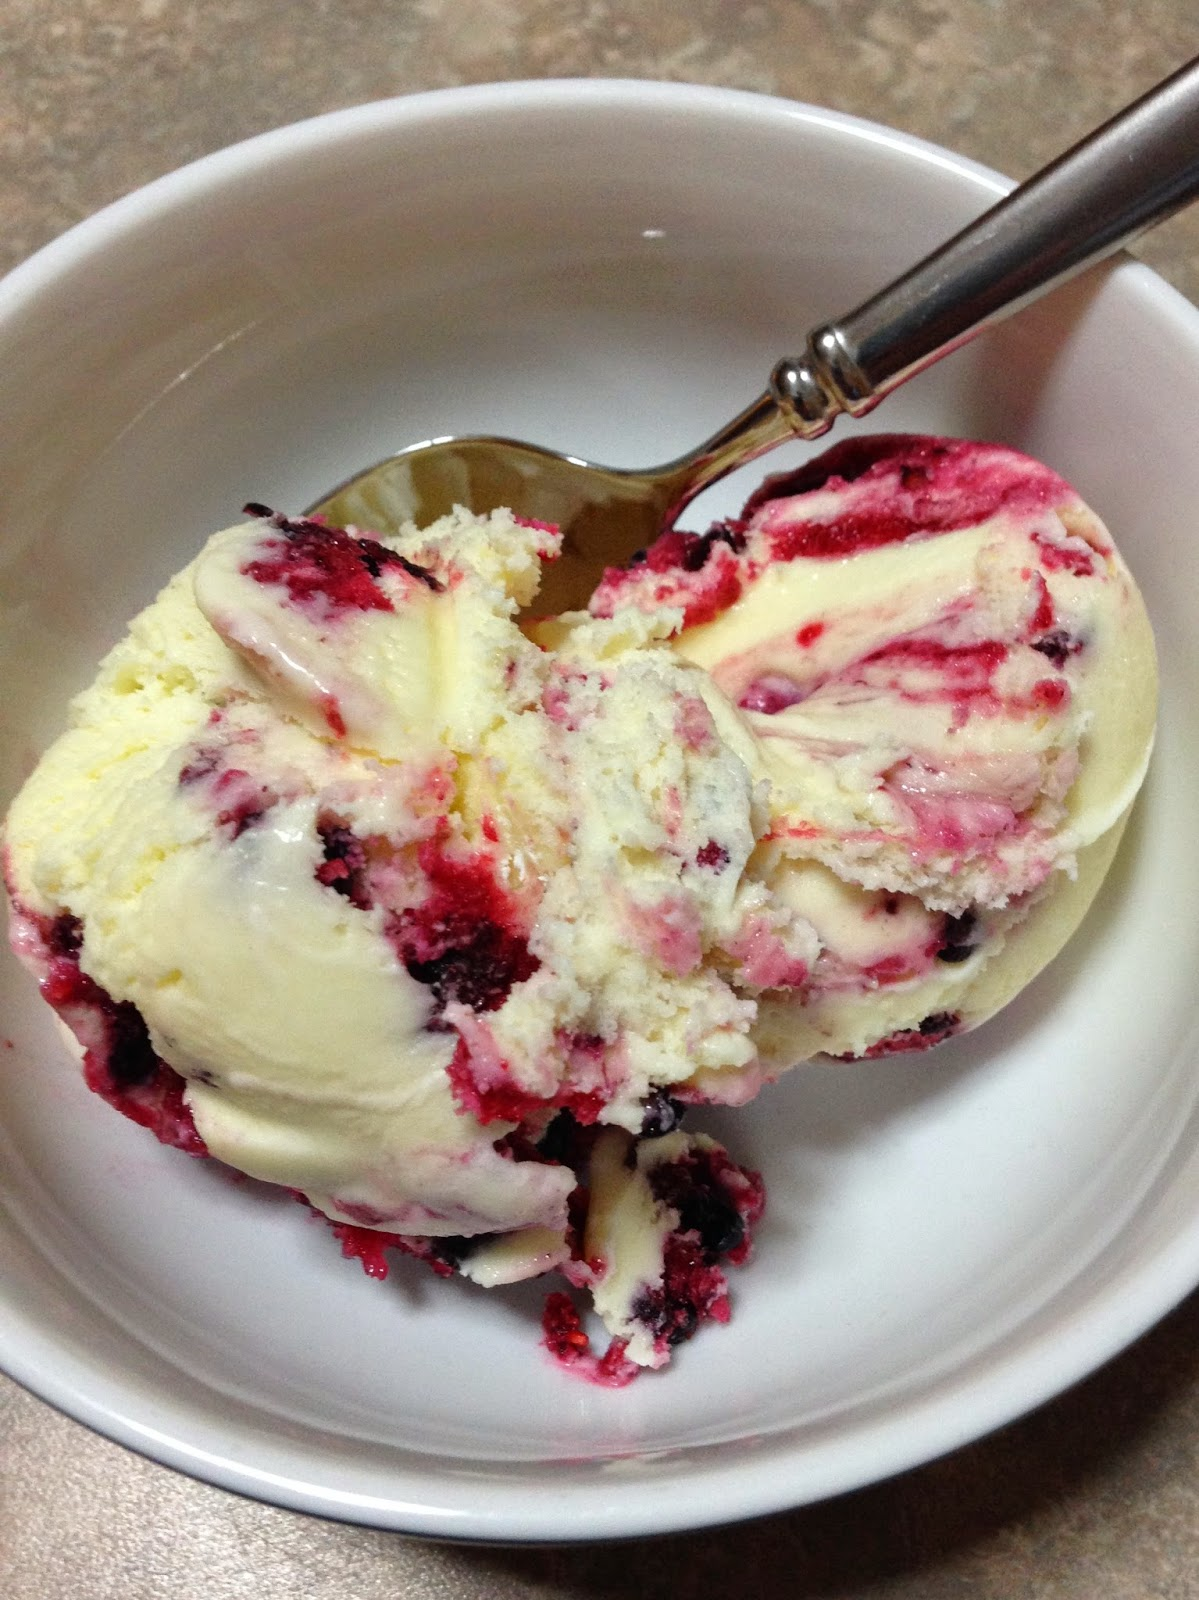 White Chocolae Ice Cream with Berry Swirl: Savory Sweet and Satisfying